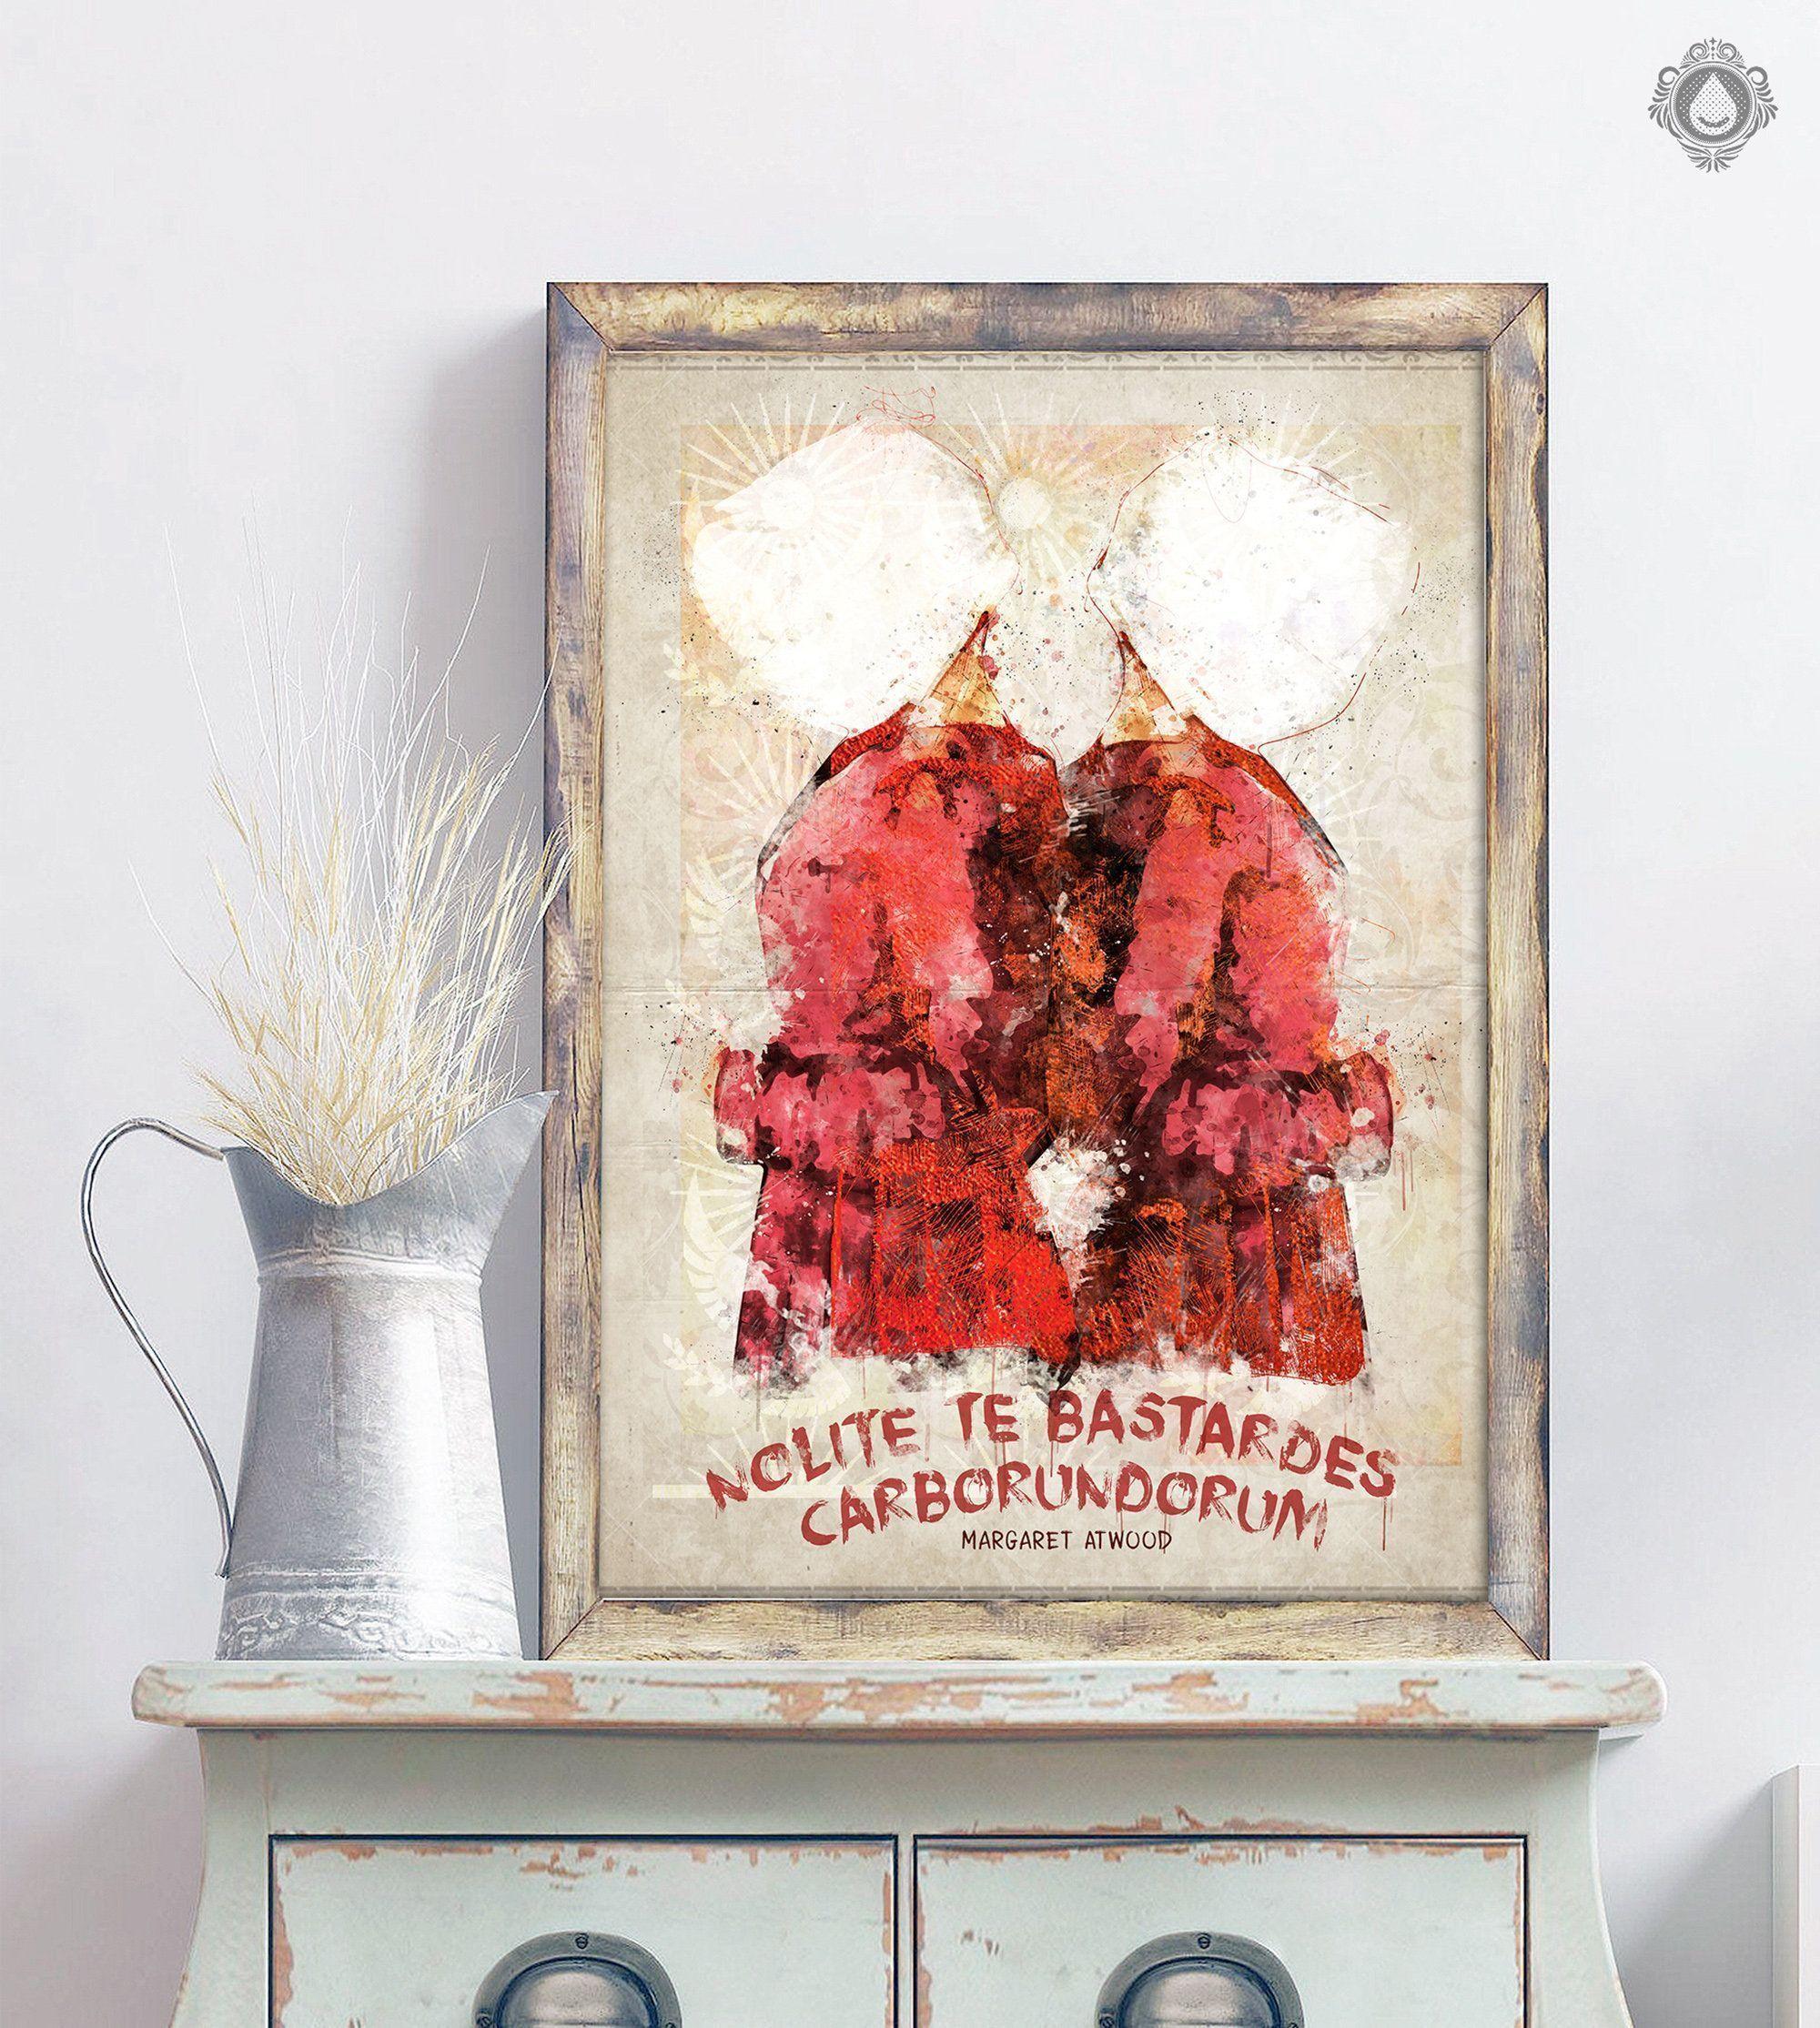 Nolite Te Bastardes Carborundorum - The Handmaid's Tale - Margaret Atwood - Printable Art - For Book Lovers #margaretatwood Nolite Te Bastardes Carborundorum - The Handmaid's Tale - Margaret Atwood - Printable Art - For Book Lovers #margaretatwood Nolite Te Bastardes Carborundorum - The Handmaid's Tale - Margaret Atwood - Printable Art - For Book Lovers #margaretatwood Nolite Te Bastardes Carborundorum - The Handmaid's Tale - Margaret Atwood - Printable Art - For Book Lovers #margaretatwood Noli